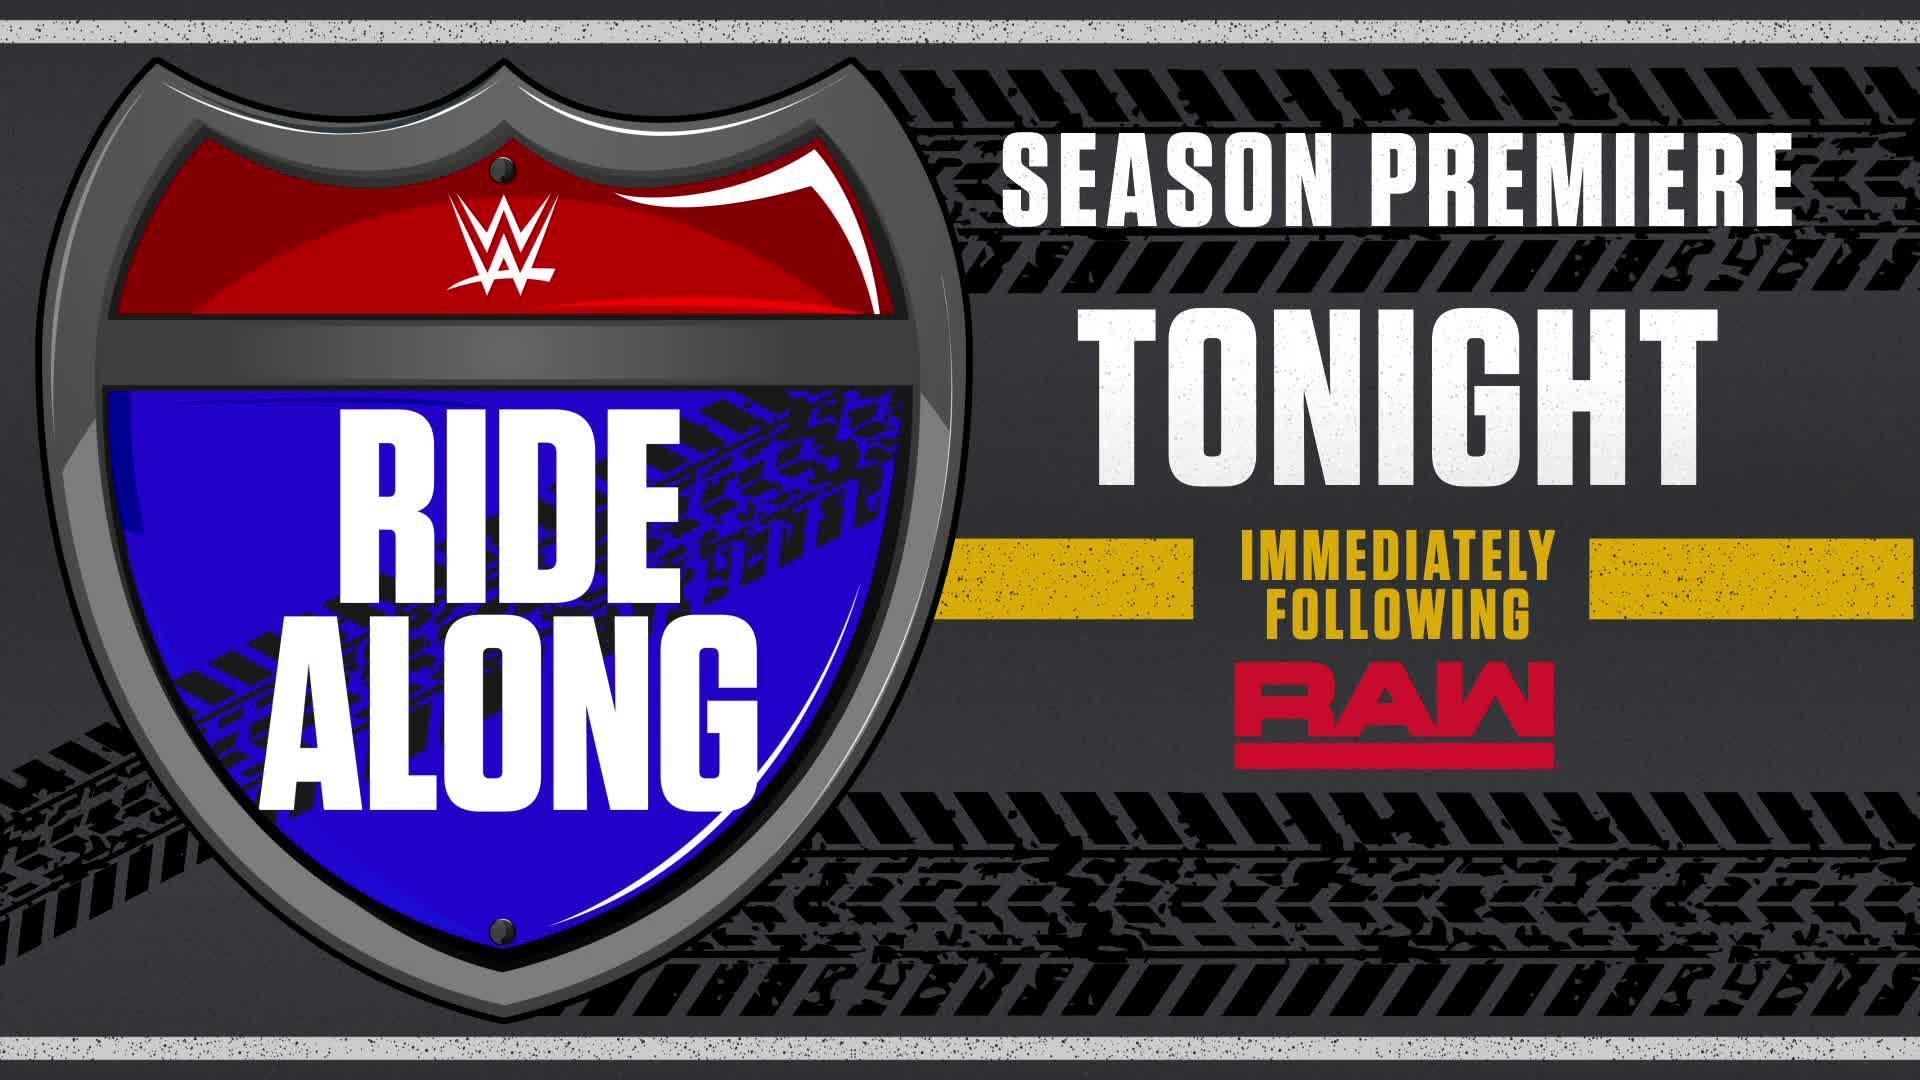 La première de la saison de WWE Ride Along - En streaming ce soir après Raw sur WWE Network